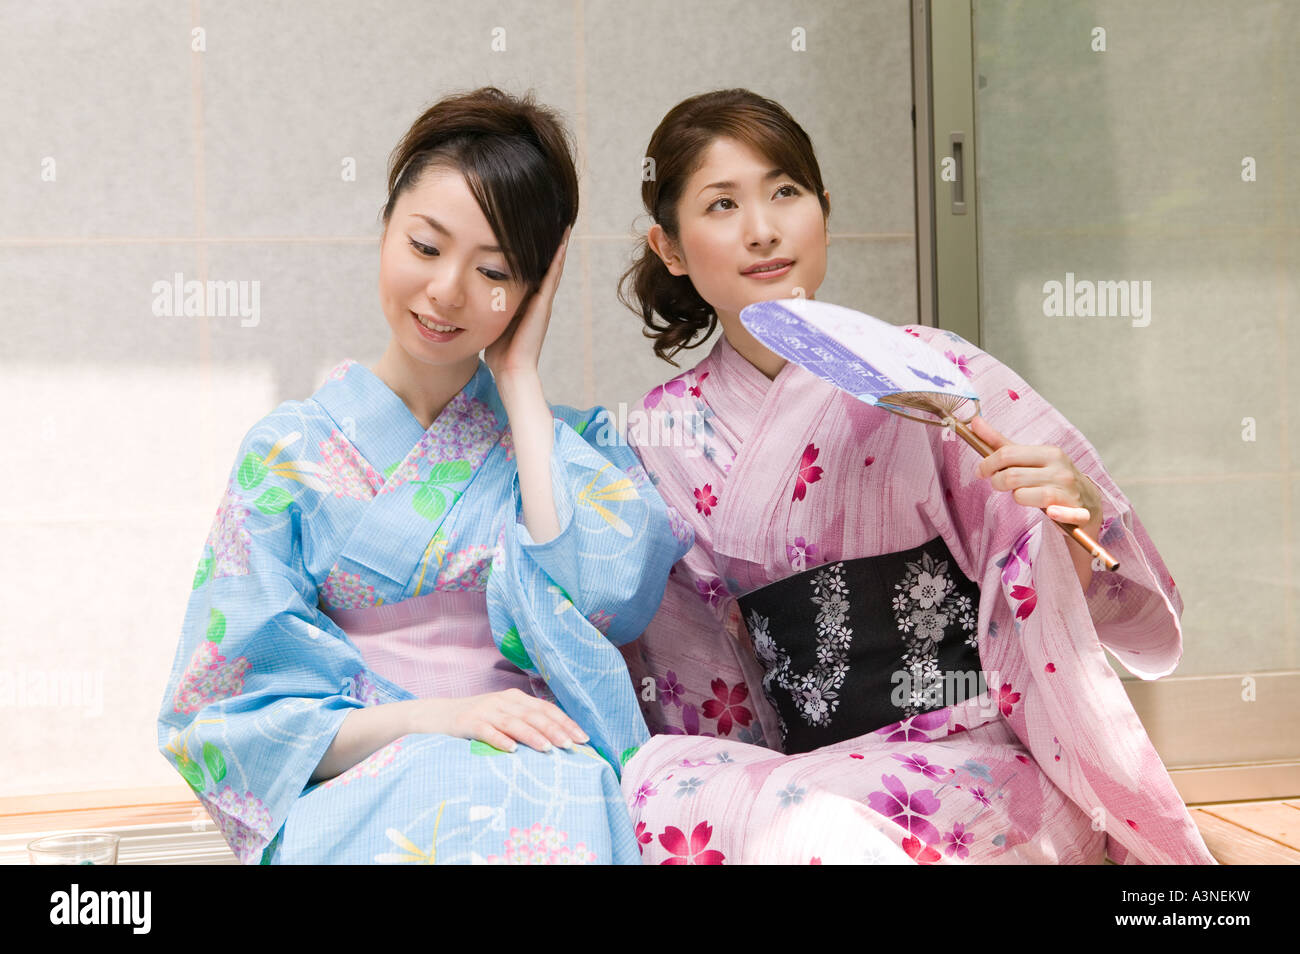 Two young women wearing yukata sitting on porch Stock Photo